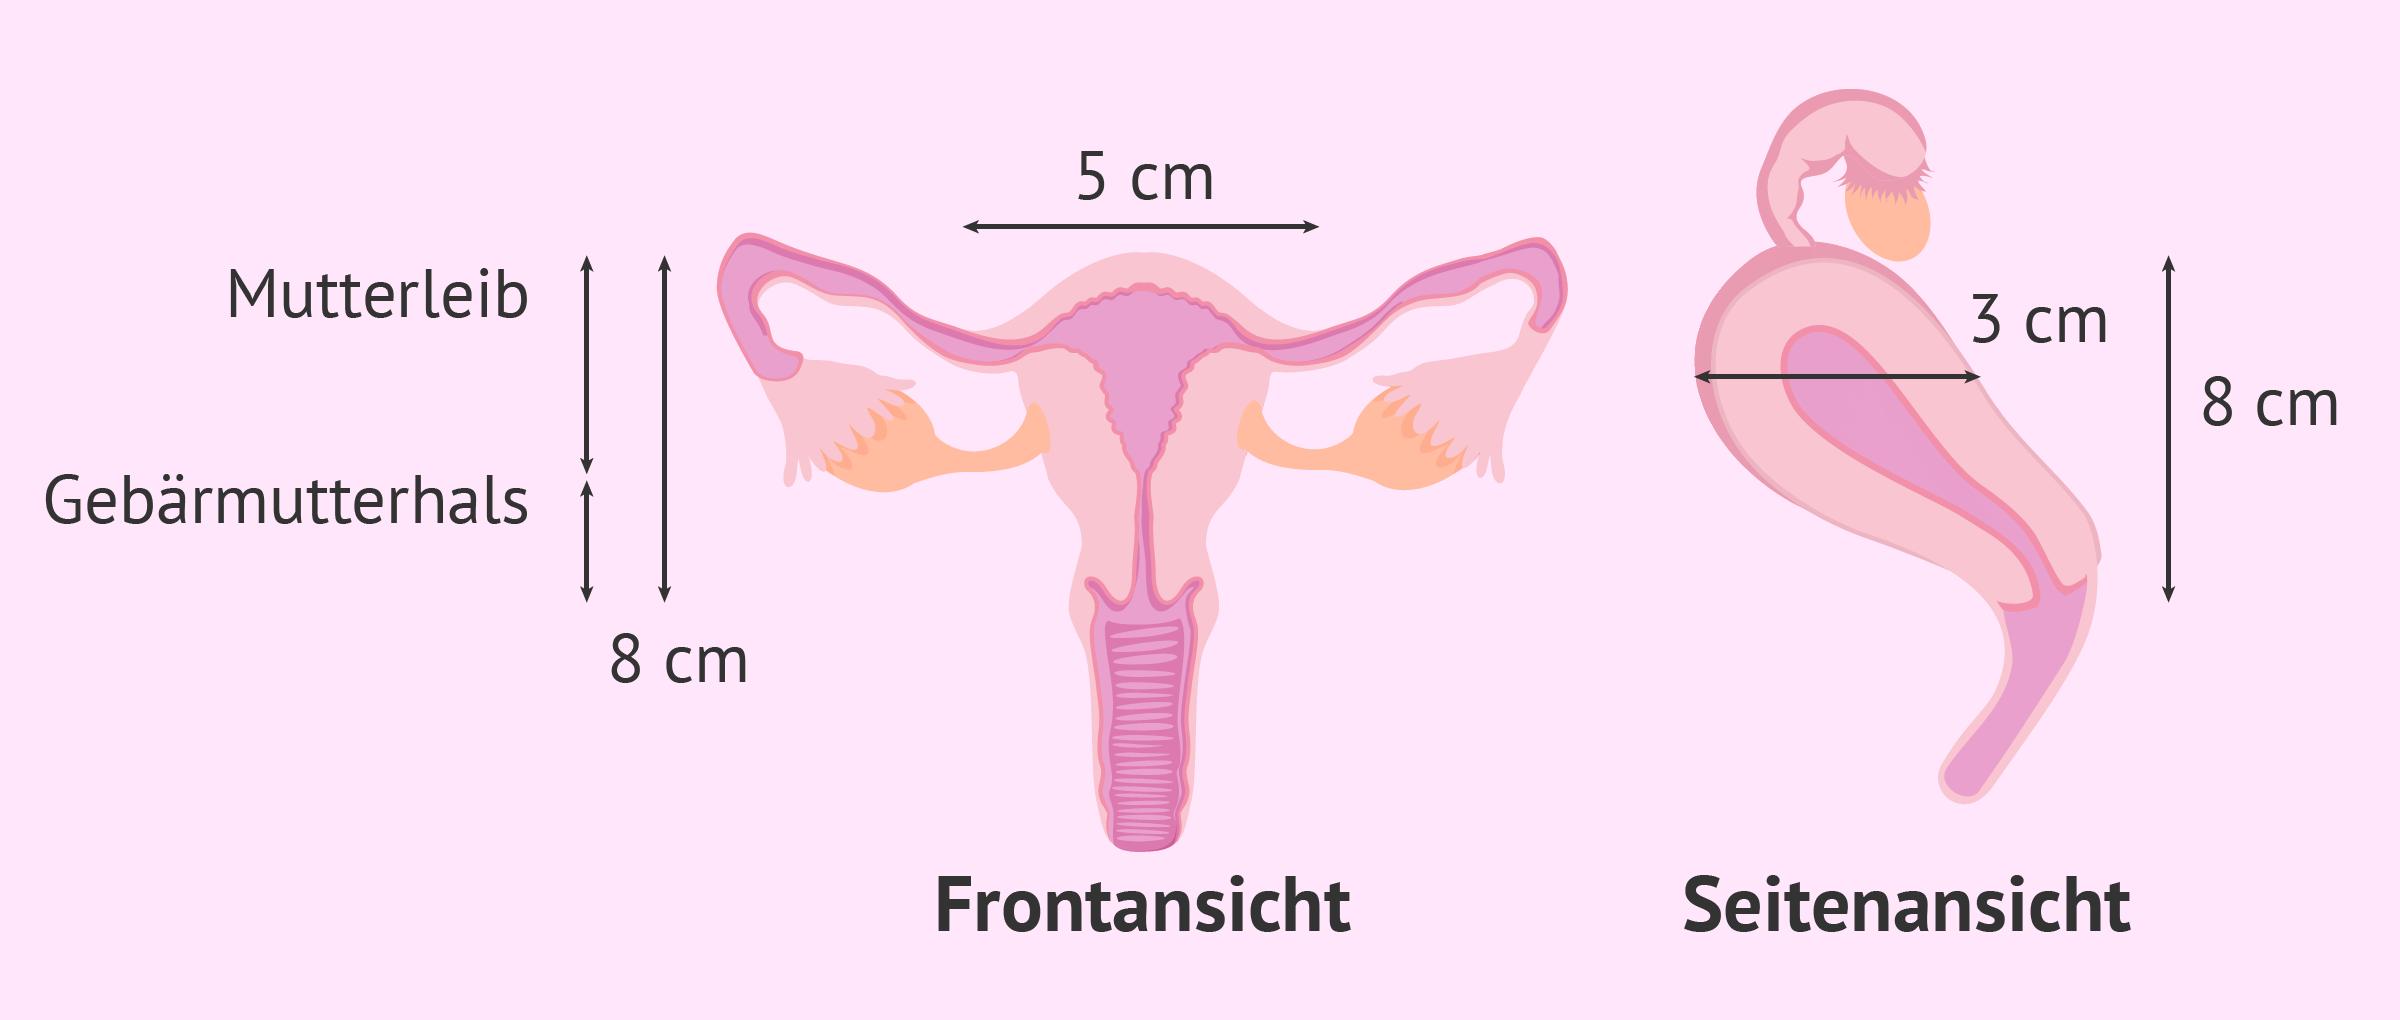 Gebärmutterfaktor